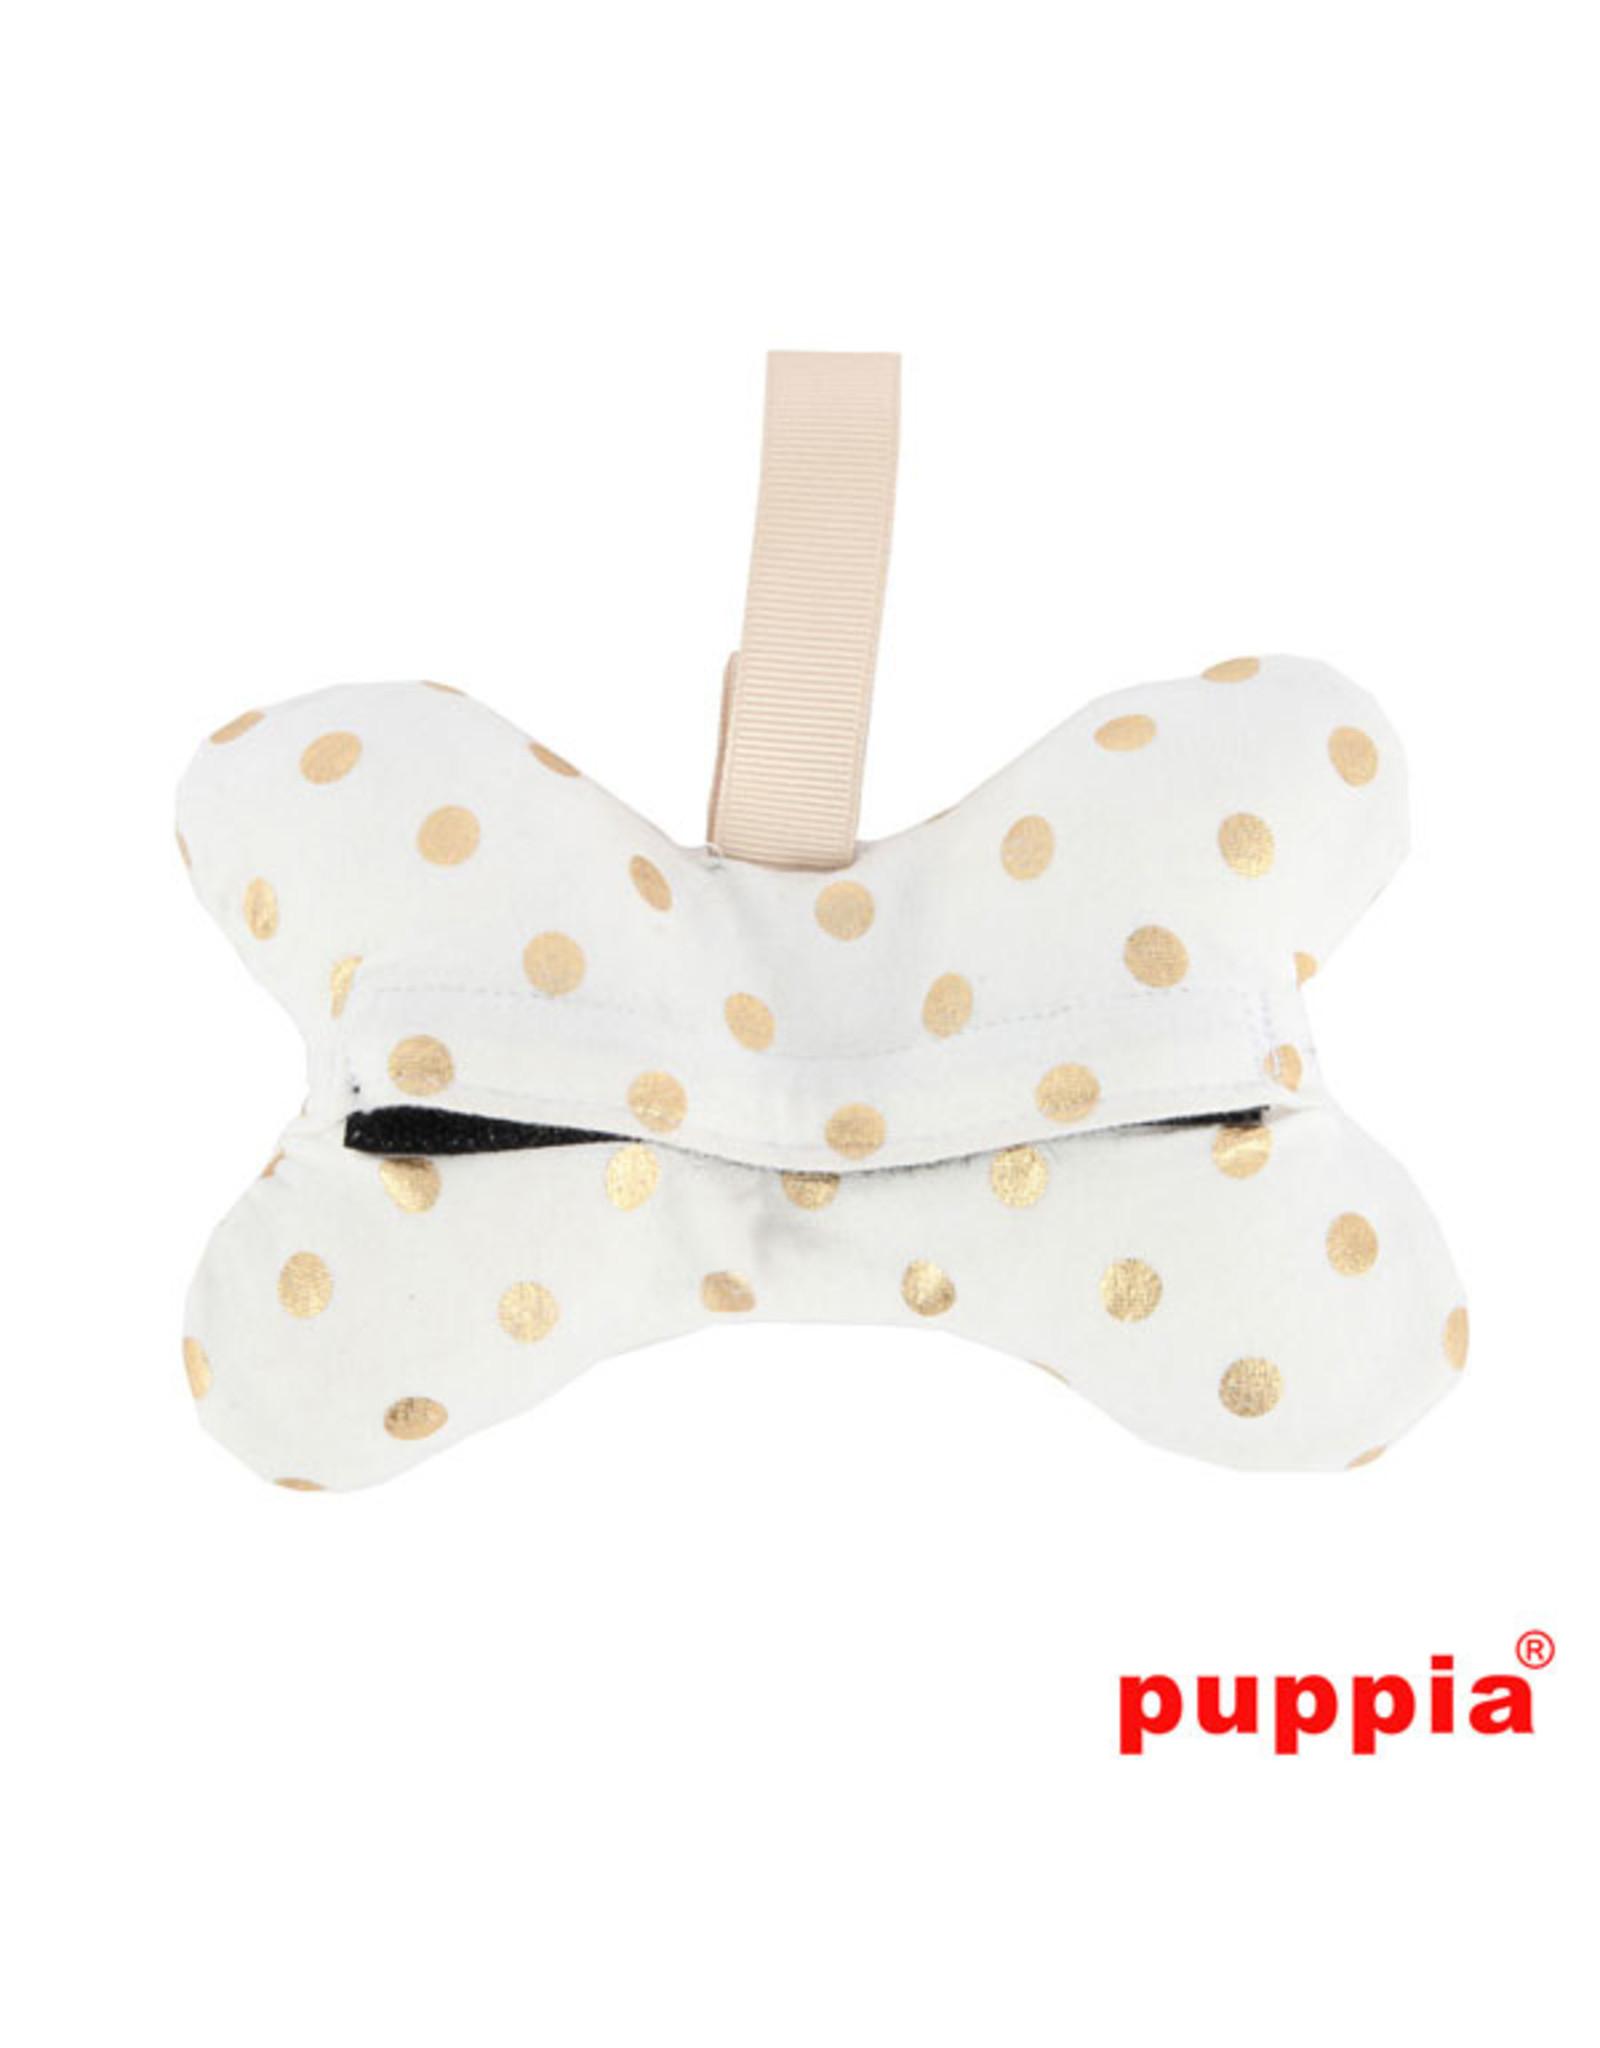 Puppia Puppia Modern Dotty Waste Bag Dispenser Ivory